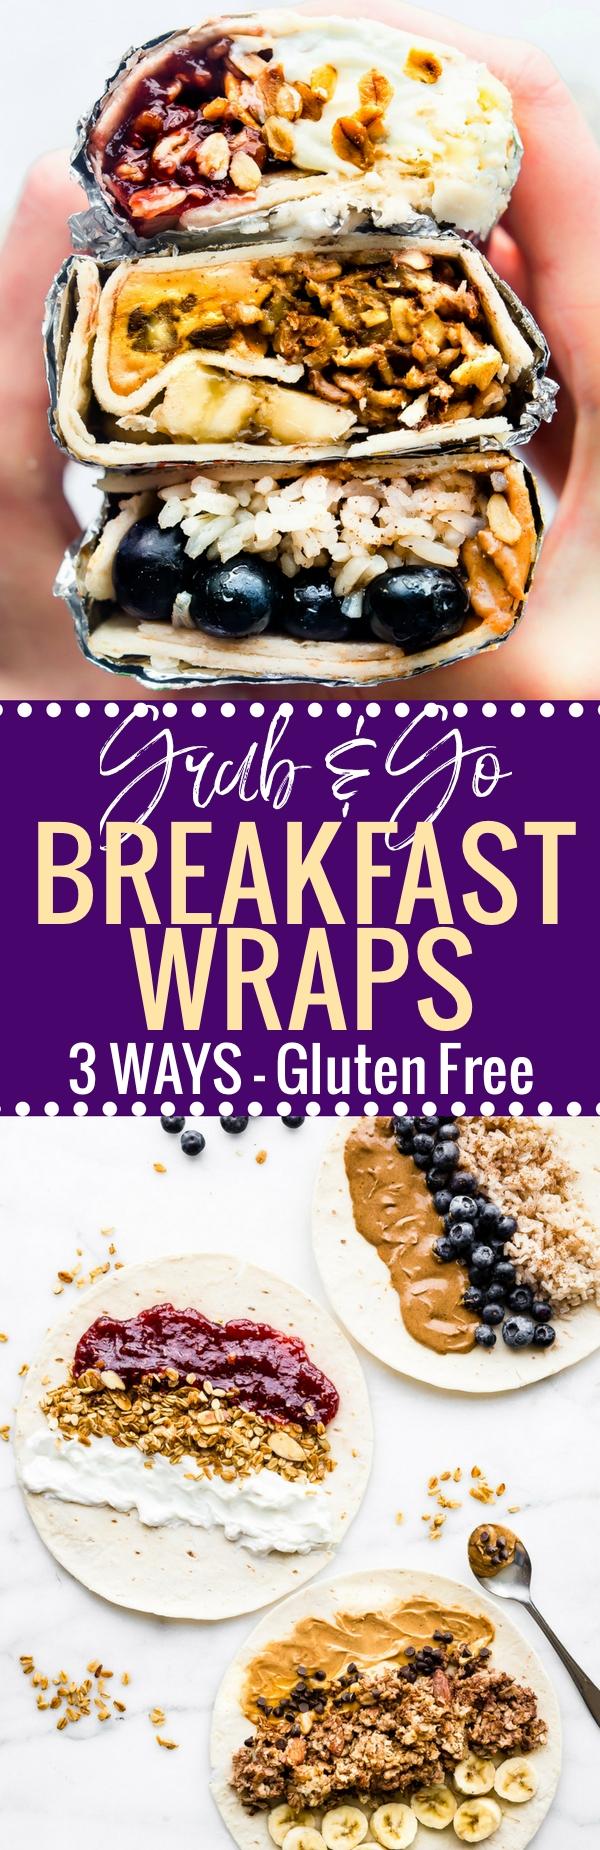 10 Spectacular Gluten Free Breakfast Ideas Quick grab and go gluten free breakfast wraps 3 ways 1 2021